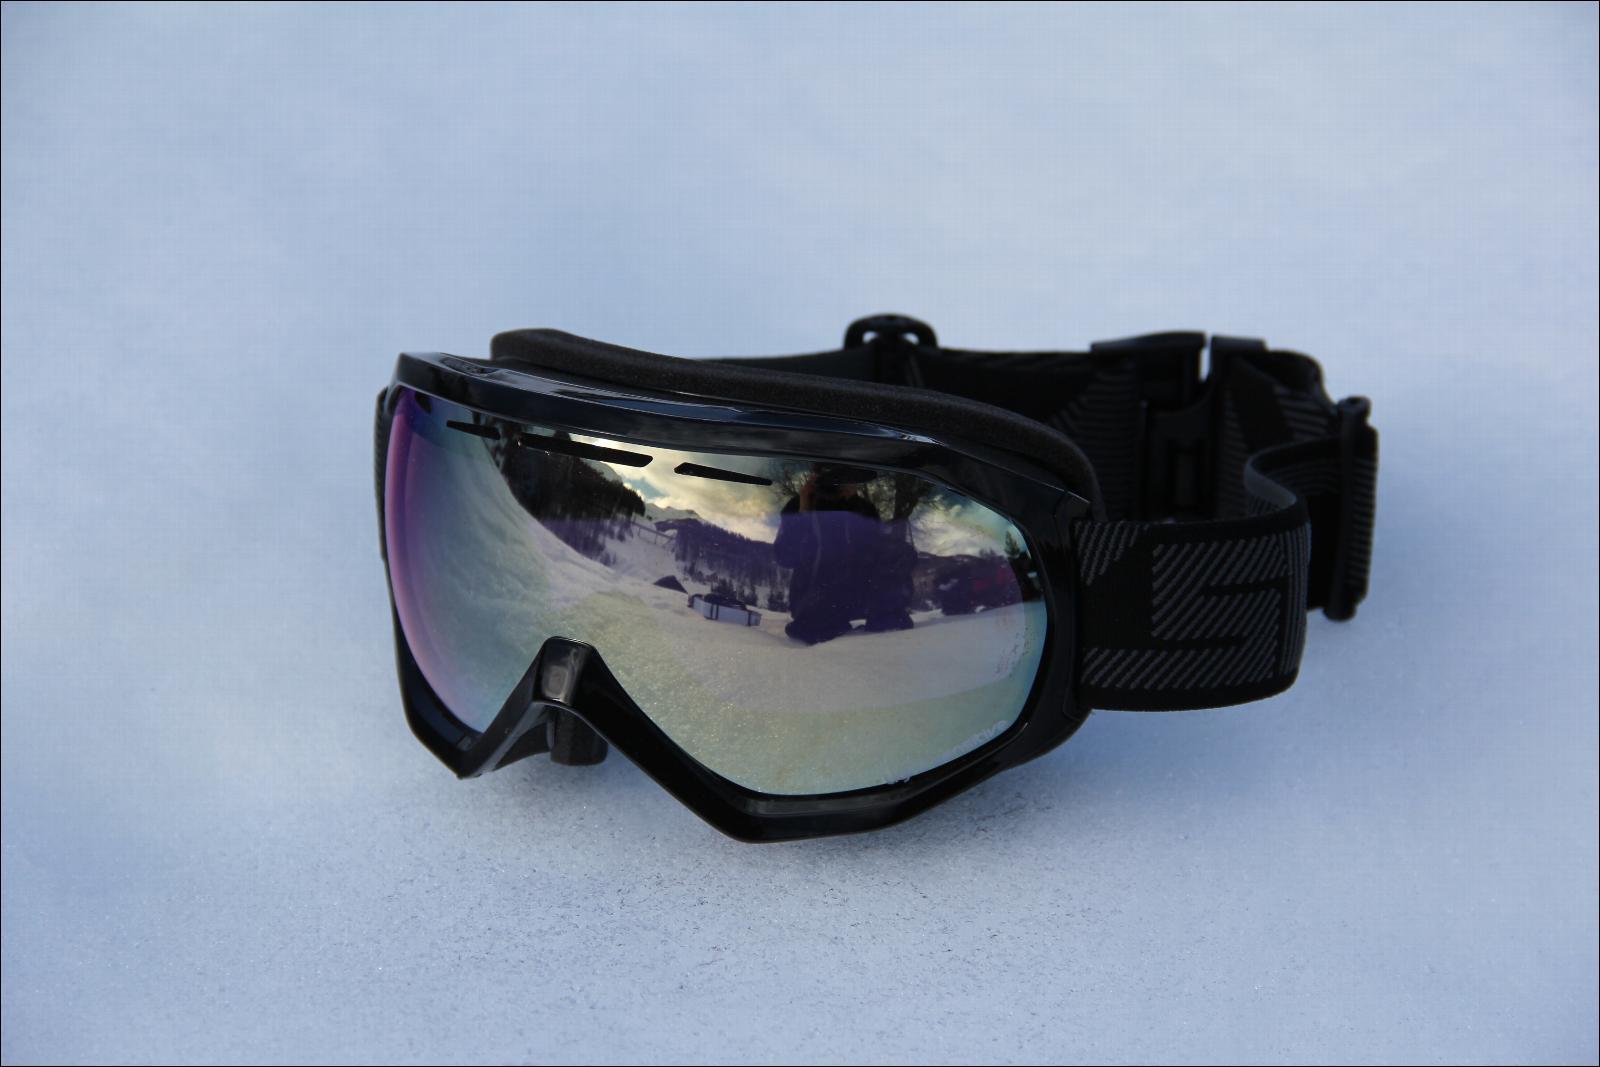 masque de ski scott notice otg black ecran light sensitive bronze chrome. Black Bedroom Furniture Sets. Home Design Ideas